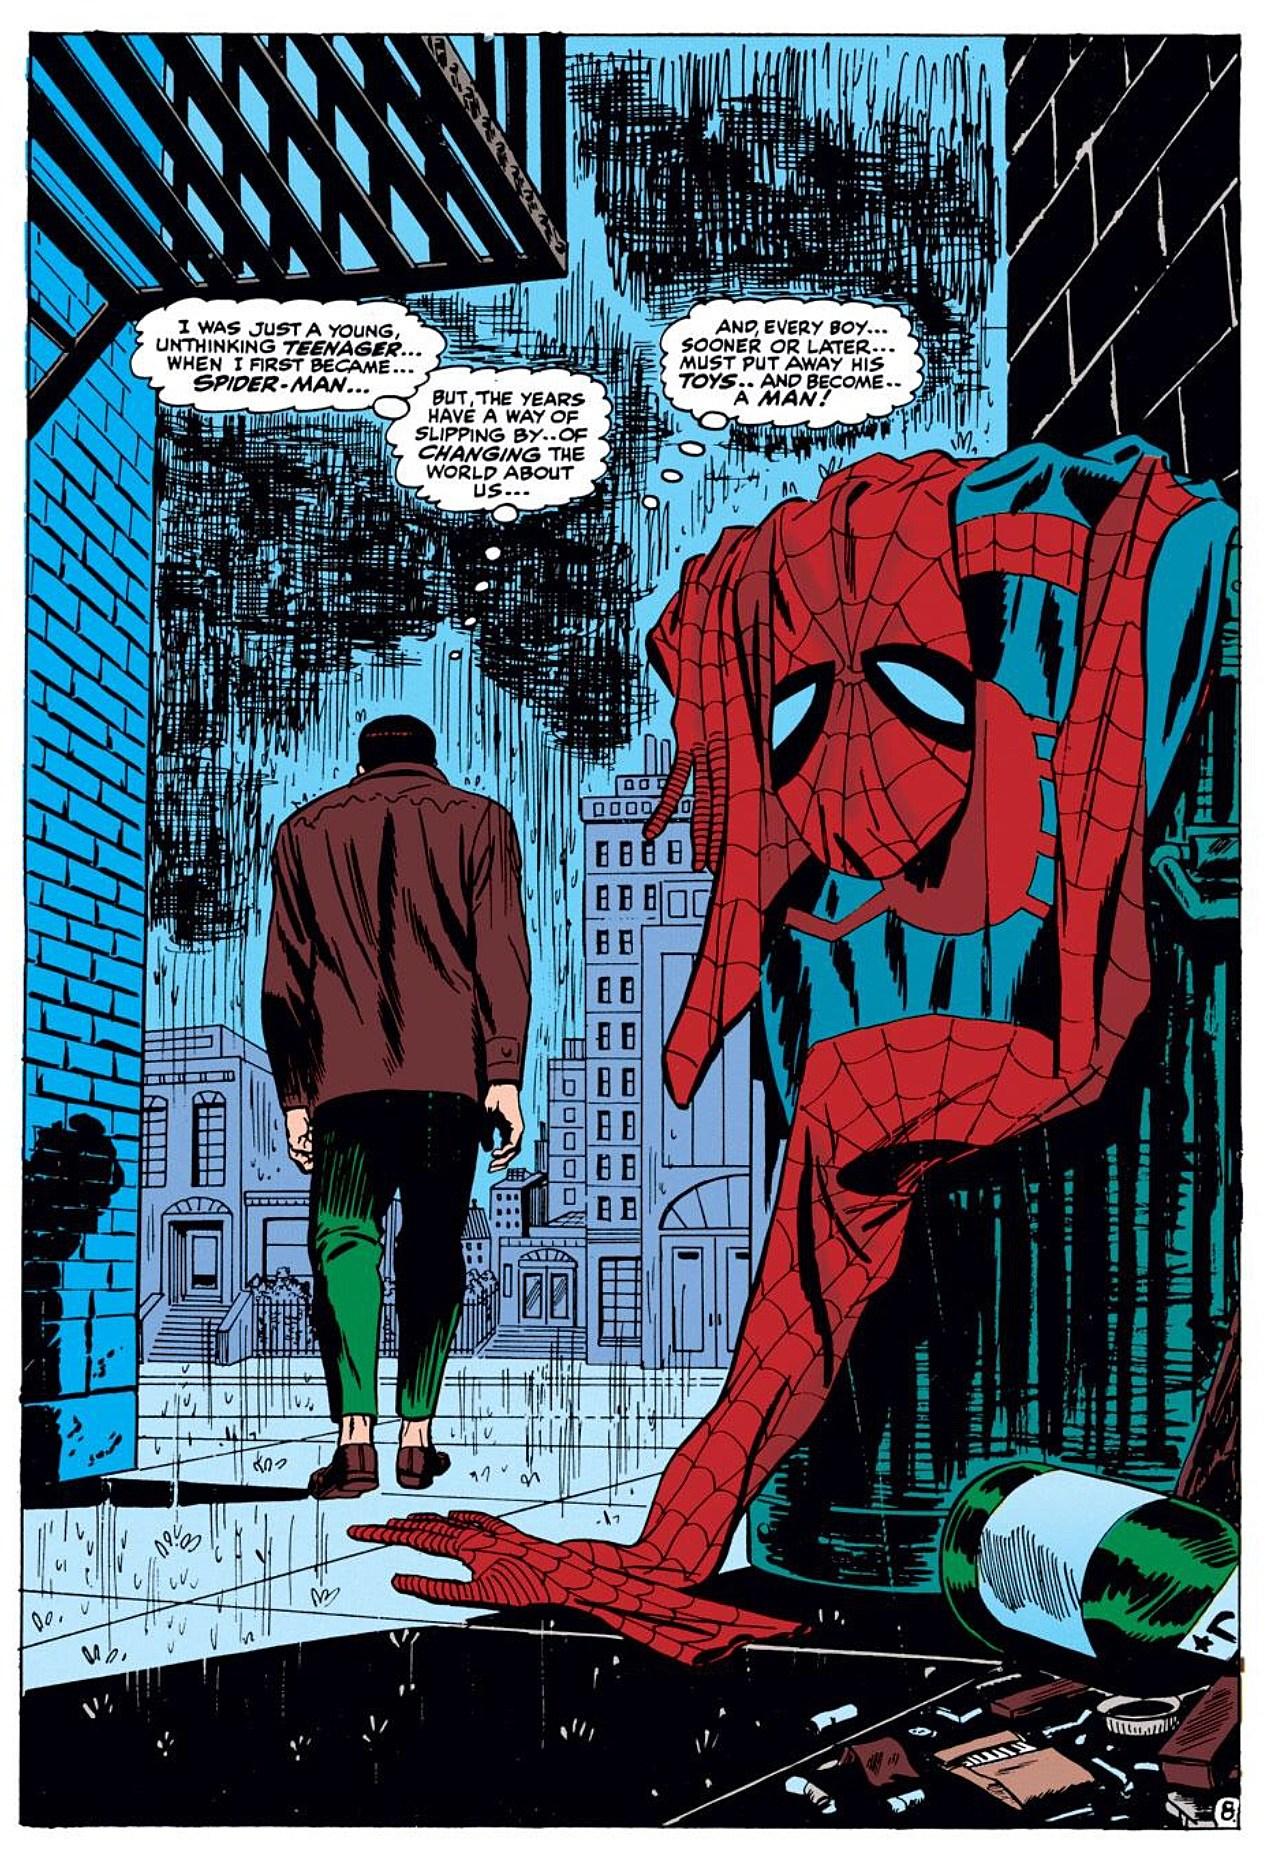 https://i0.wp.com/comicsalliance.com/files/2016/02/SpiderManNoMore1.jpg